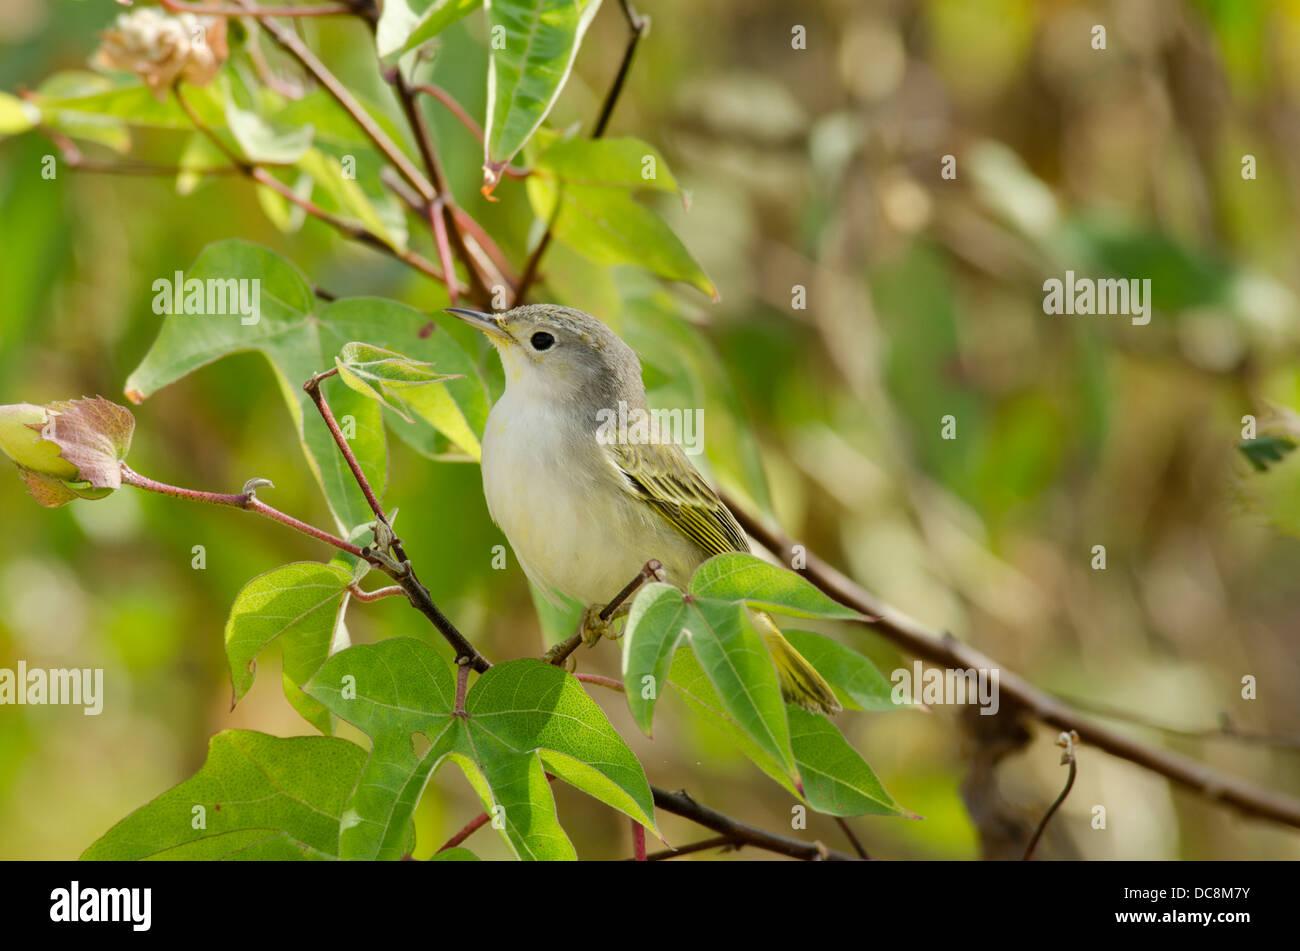 Ecuador, Galapagos, San Cristobal. Schnäpperrohrsänger im Baum (endemische Arten: Dendroica Petechia Aureola). Stockbild